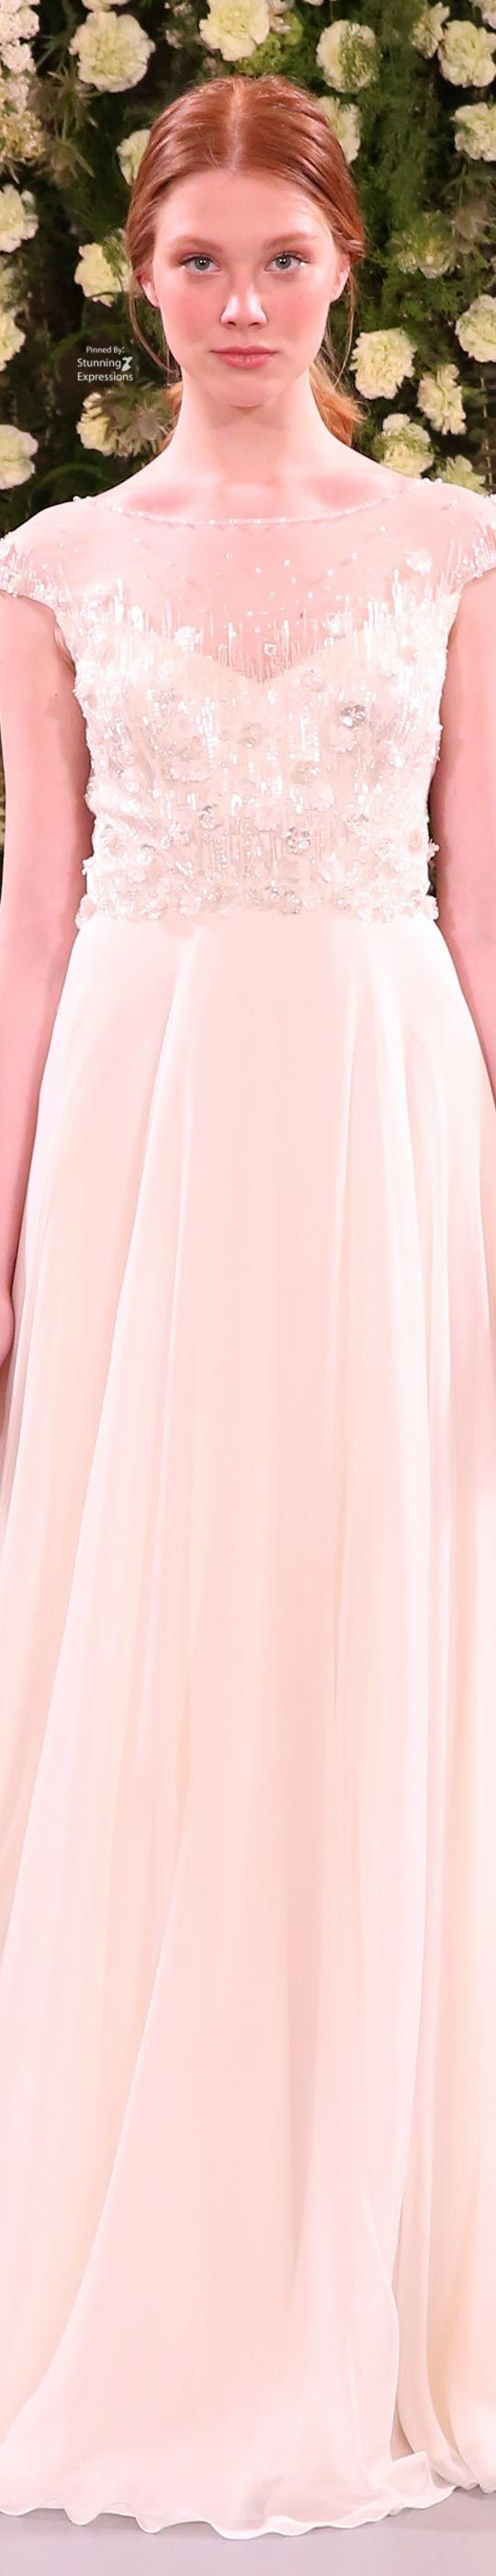 Jenny Packham Bridal Spring 2018 | DREAM WEDDING™ | Pinterest